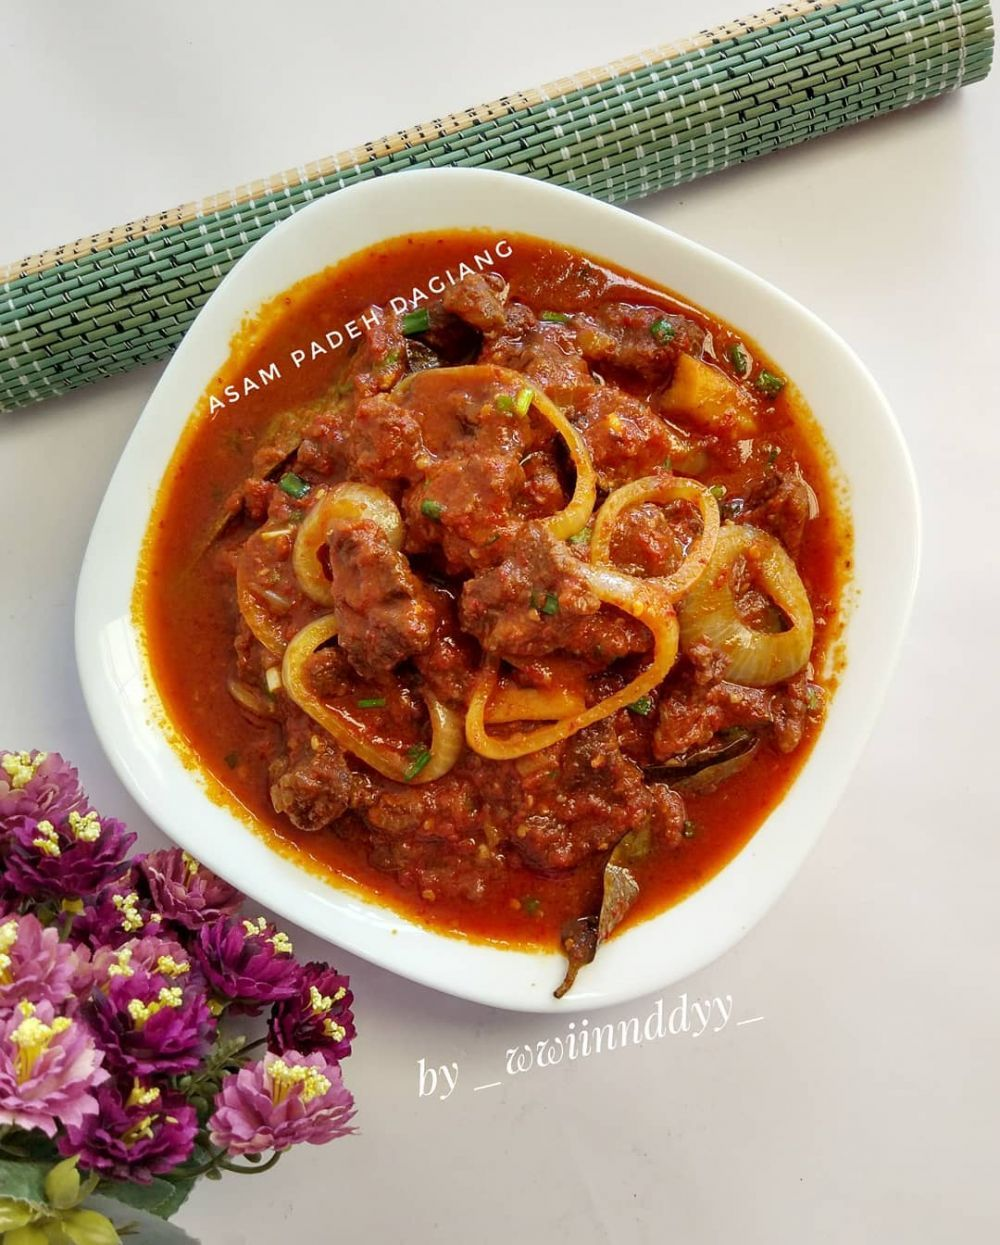 1 Dendeng Bathokok Lado Foto Instagram Resepfood Id Bahan 250 Gr Daging Sapi Iris Tipis 2 Buah Kentang Di 2020 Resep Daging Makanan Pedas Resep Masakan Asia